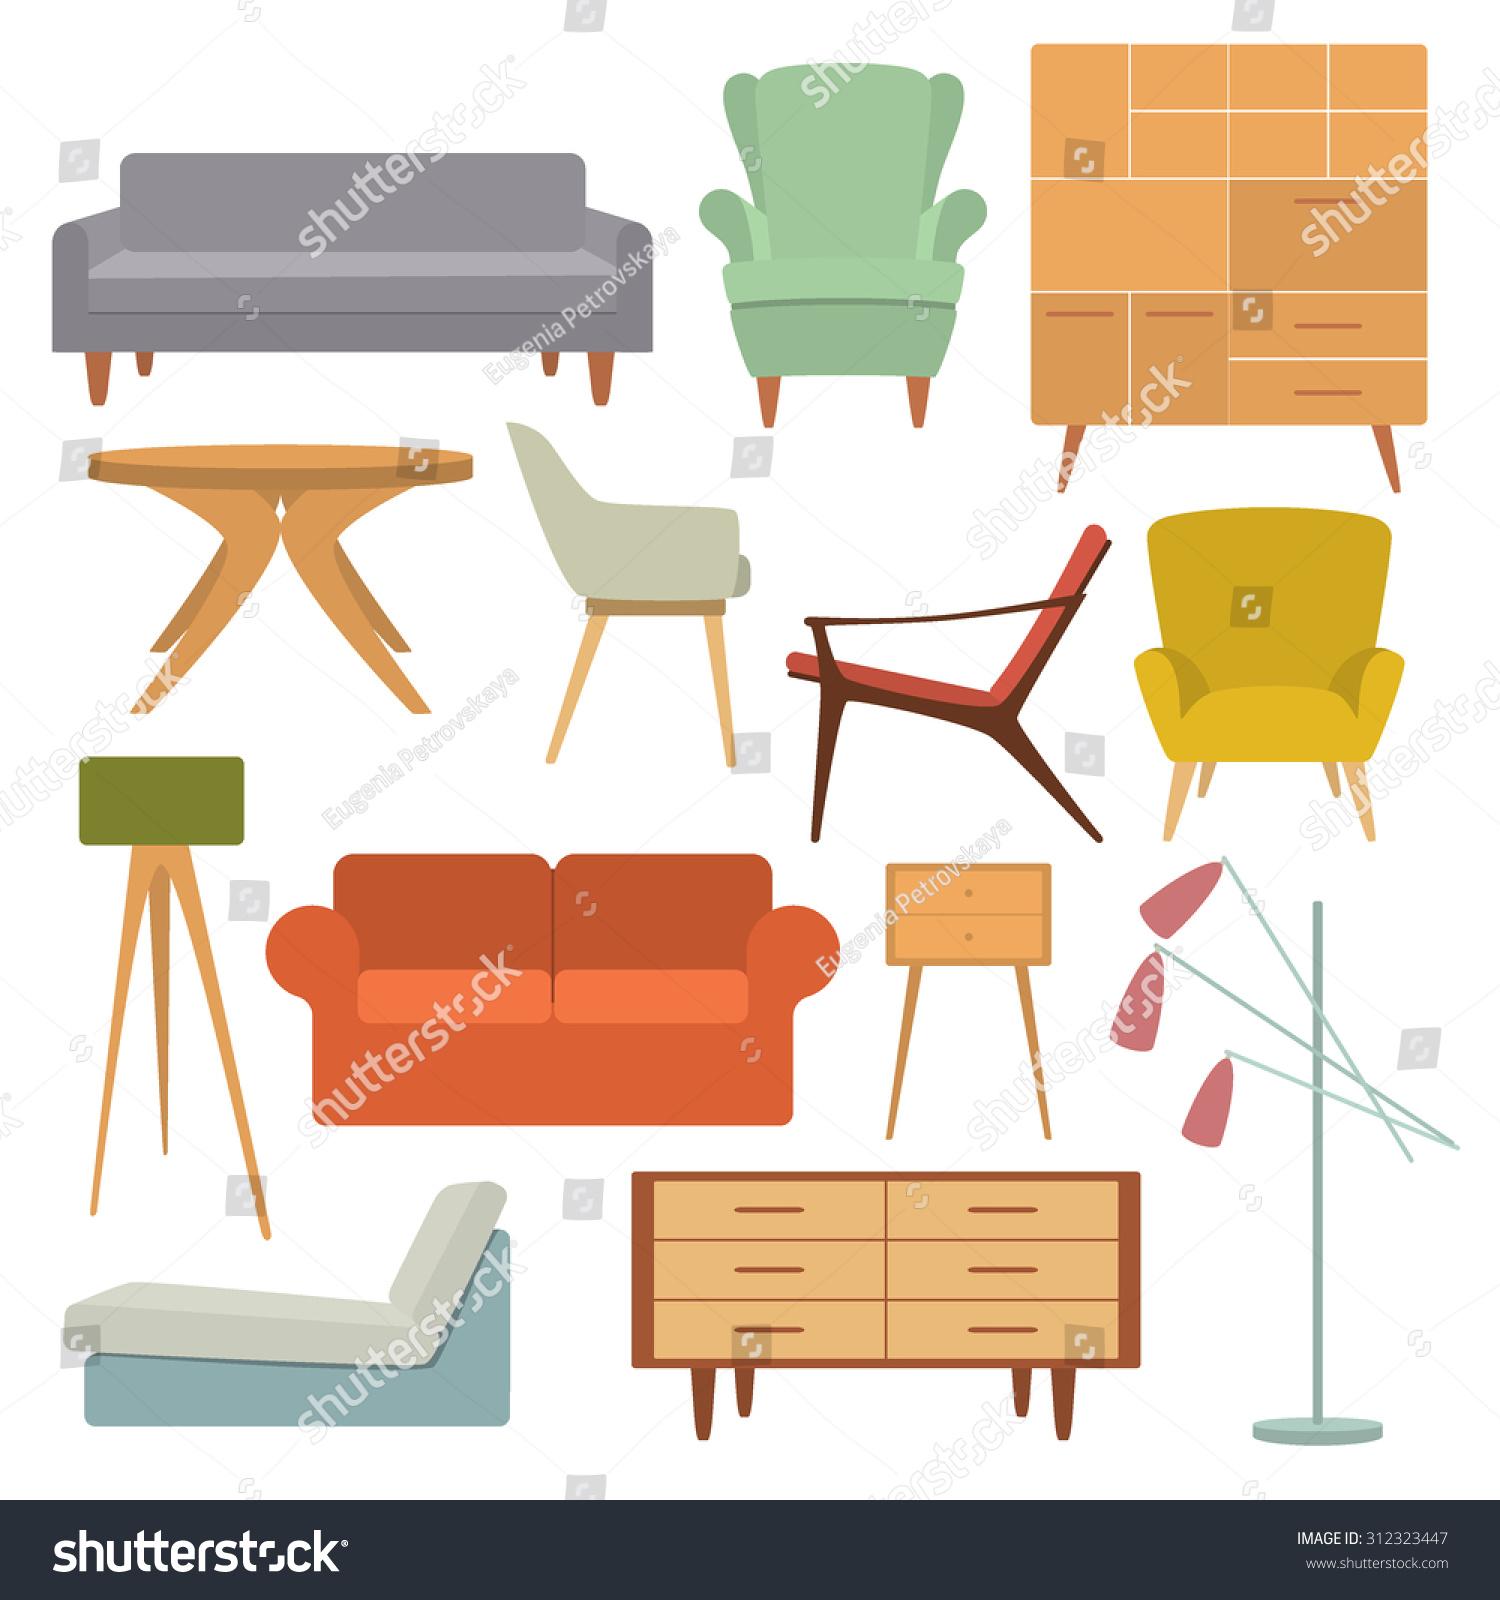 Mid Century Modern Furniture Design: Vector Illustration Of Living Room Furniture In Mid